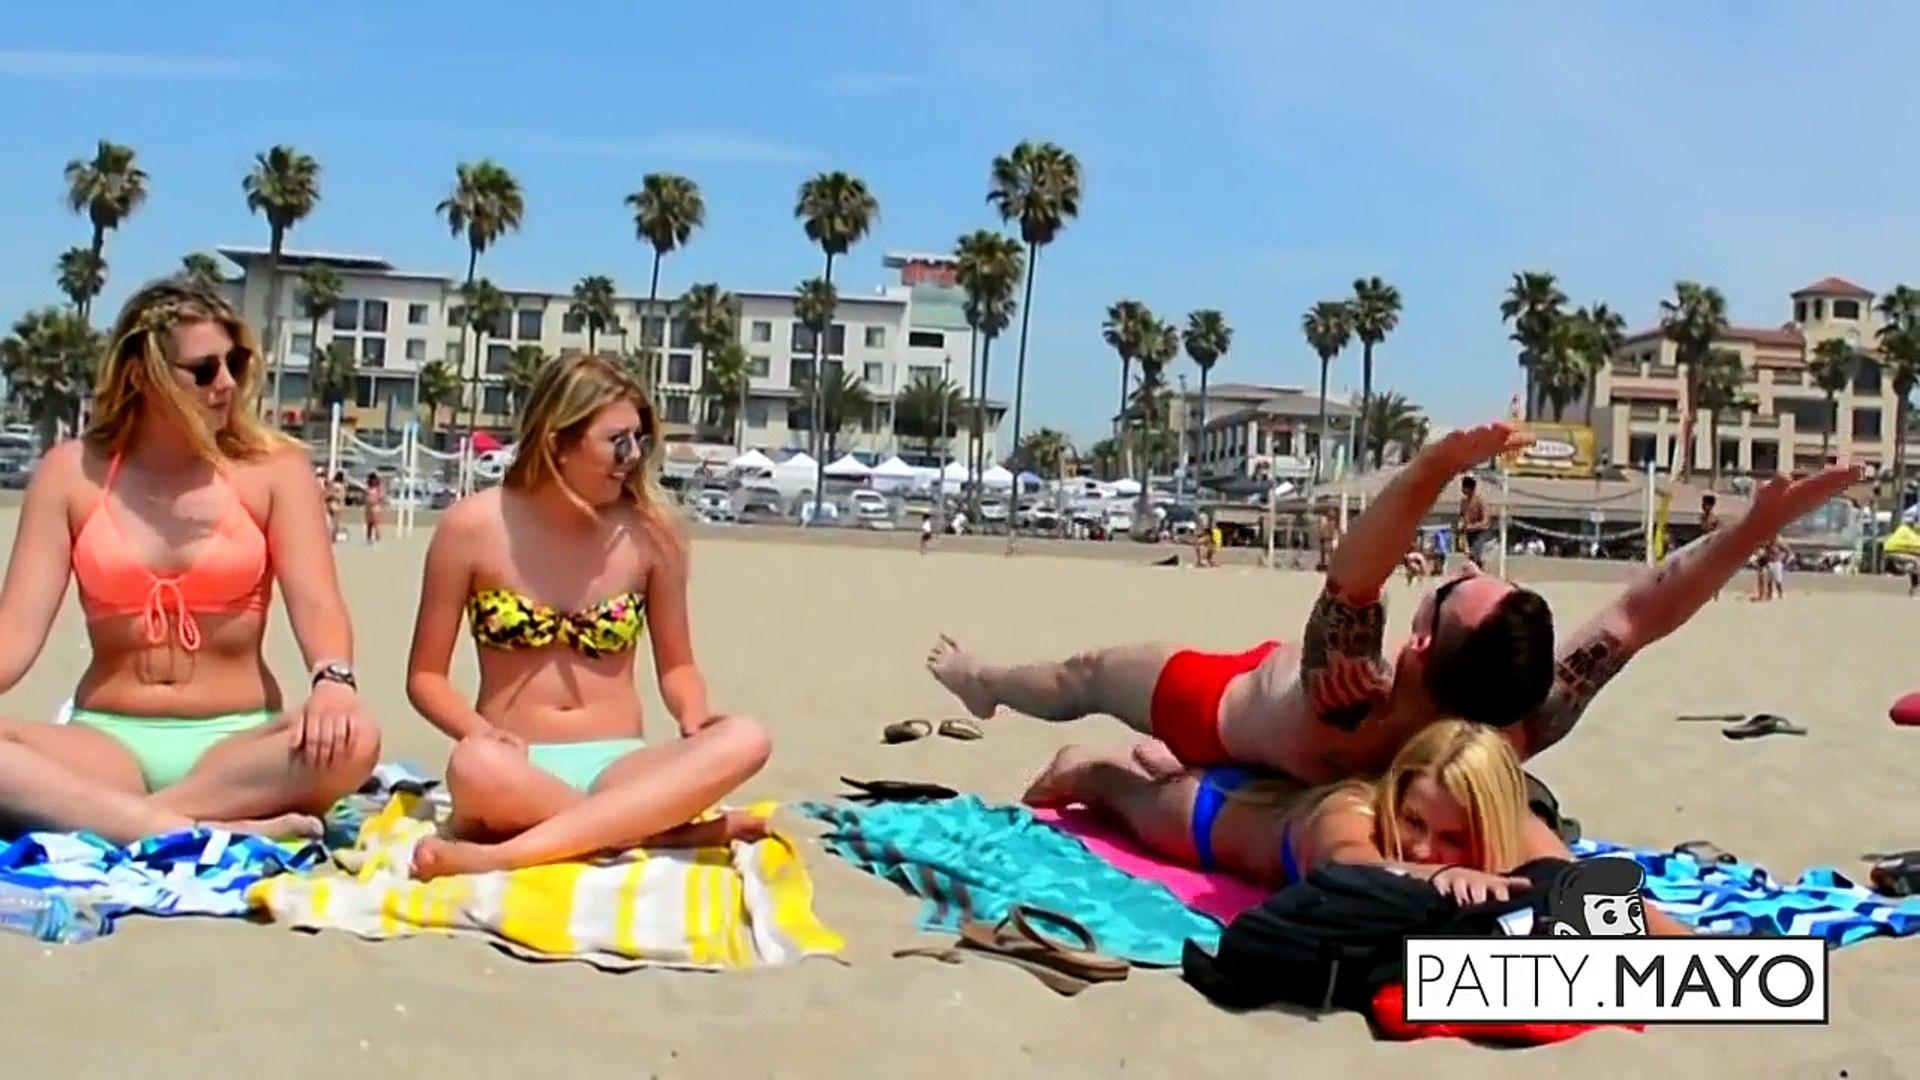 Bikinili Kızlarla Sahilde Yoga Yapmak - SEXY Girl Yoga Sessions Komedi ve Eğlence izle (video) Komed